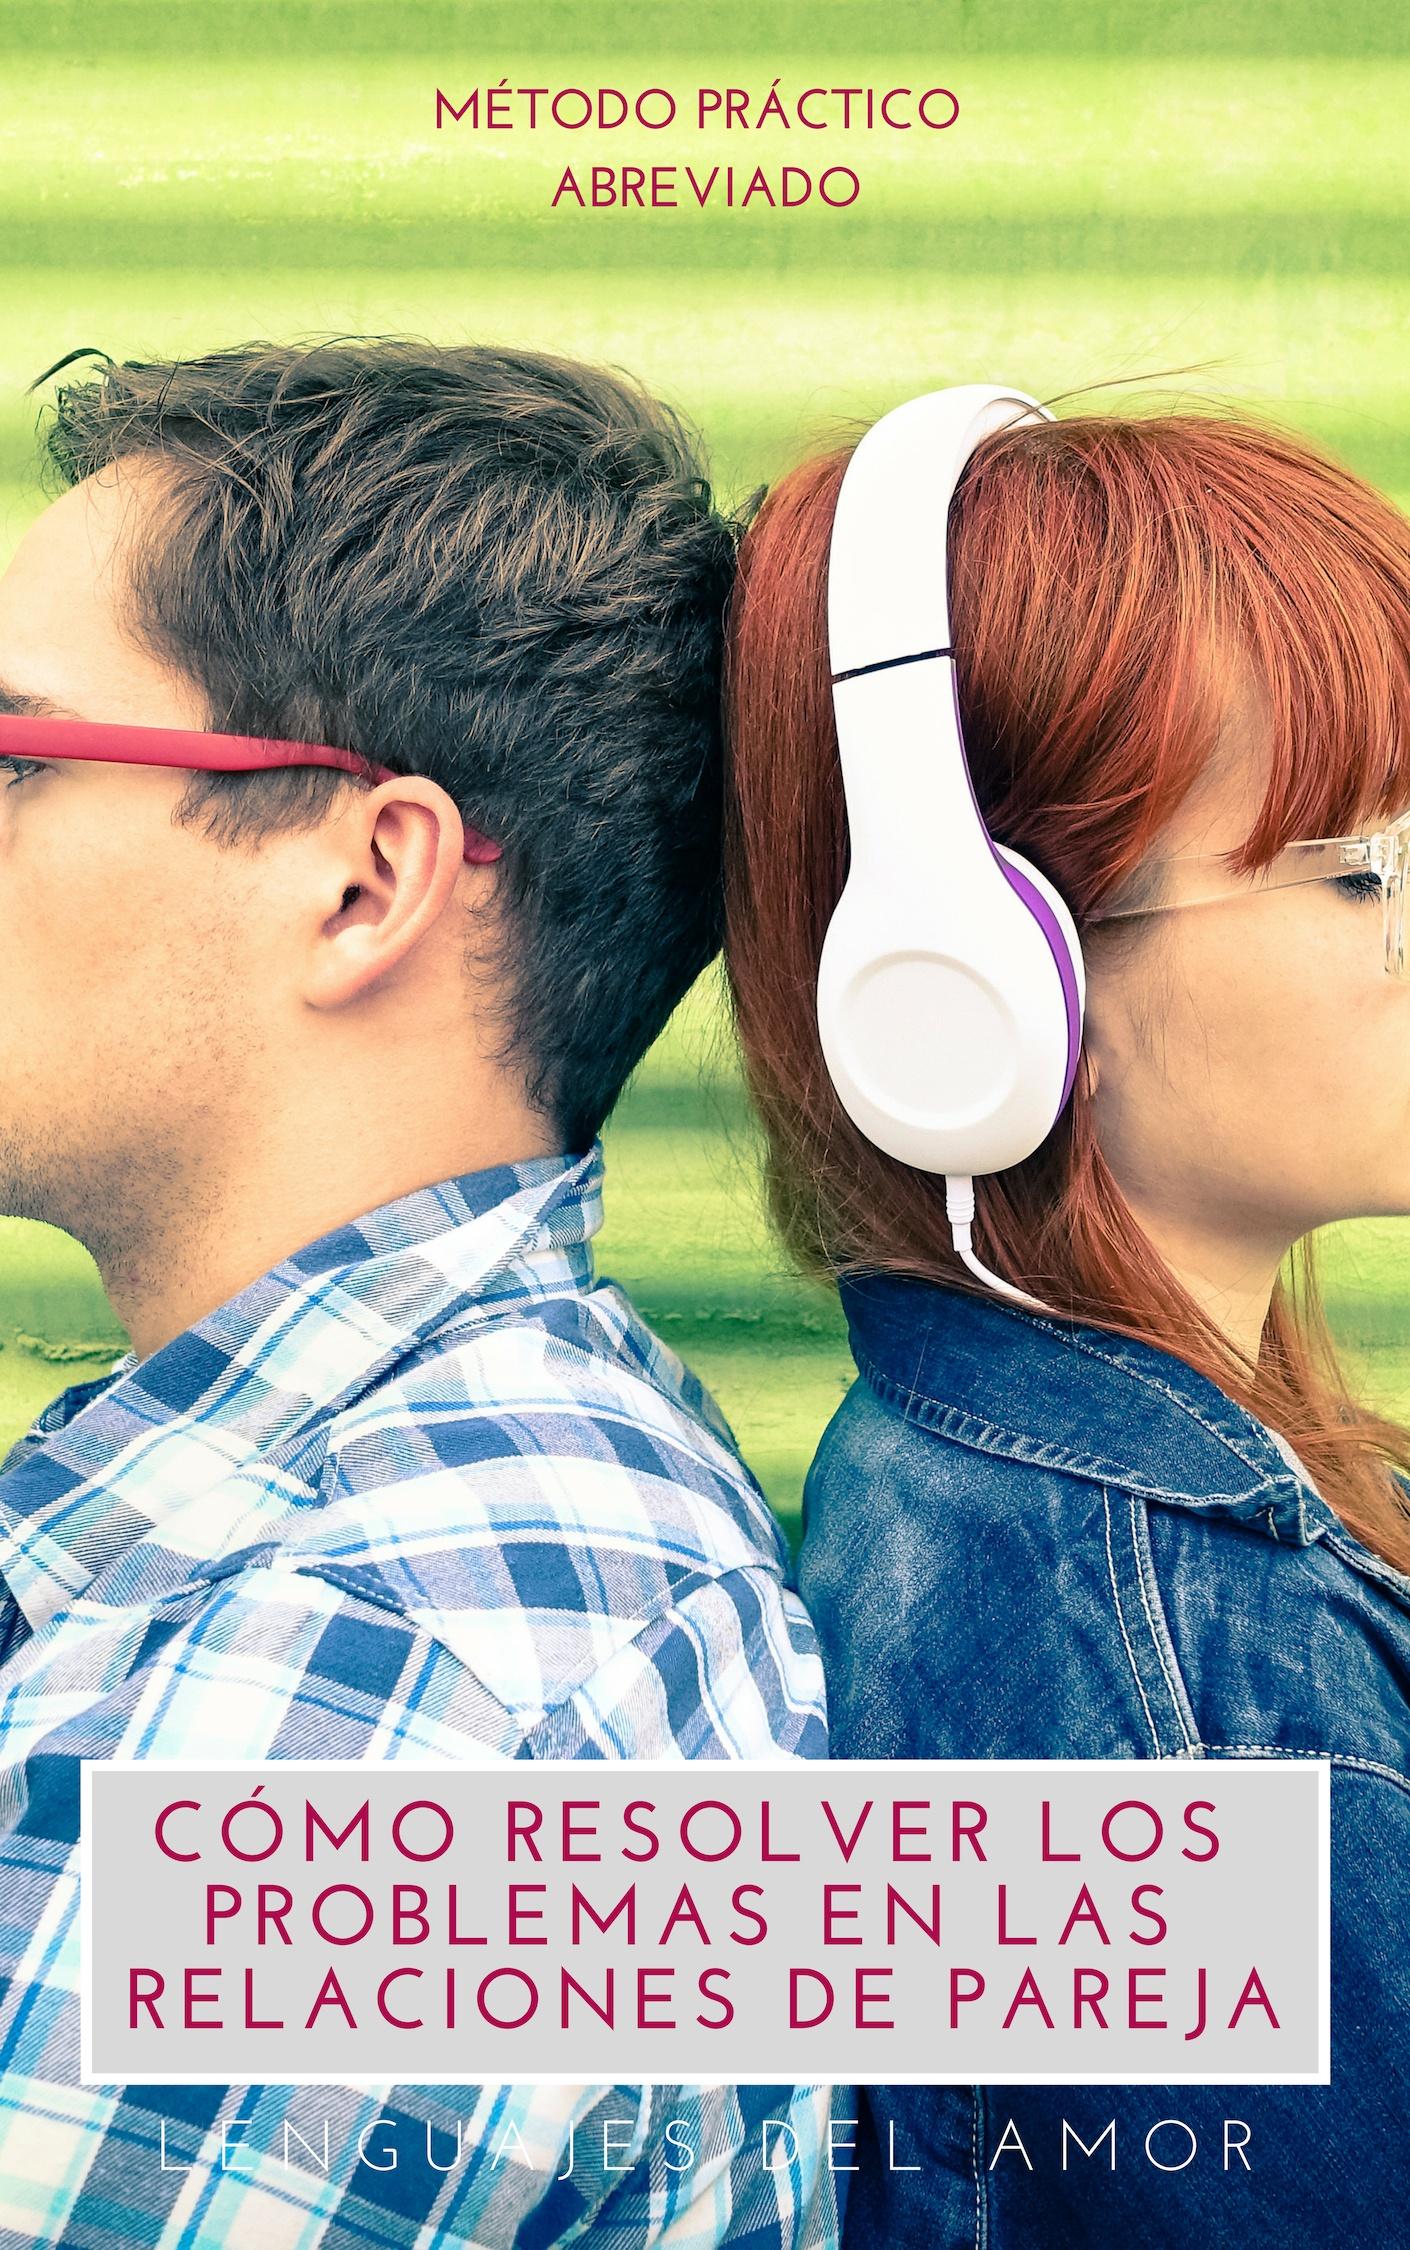 Lenguajes del amor resolver problemas de pareja